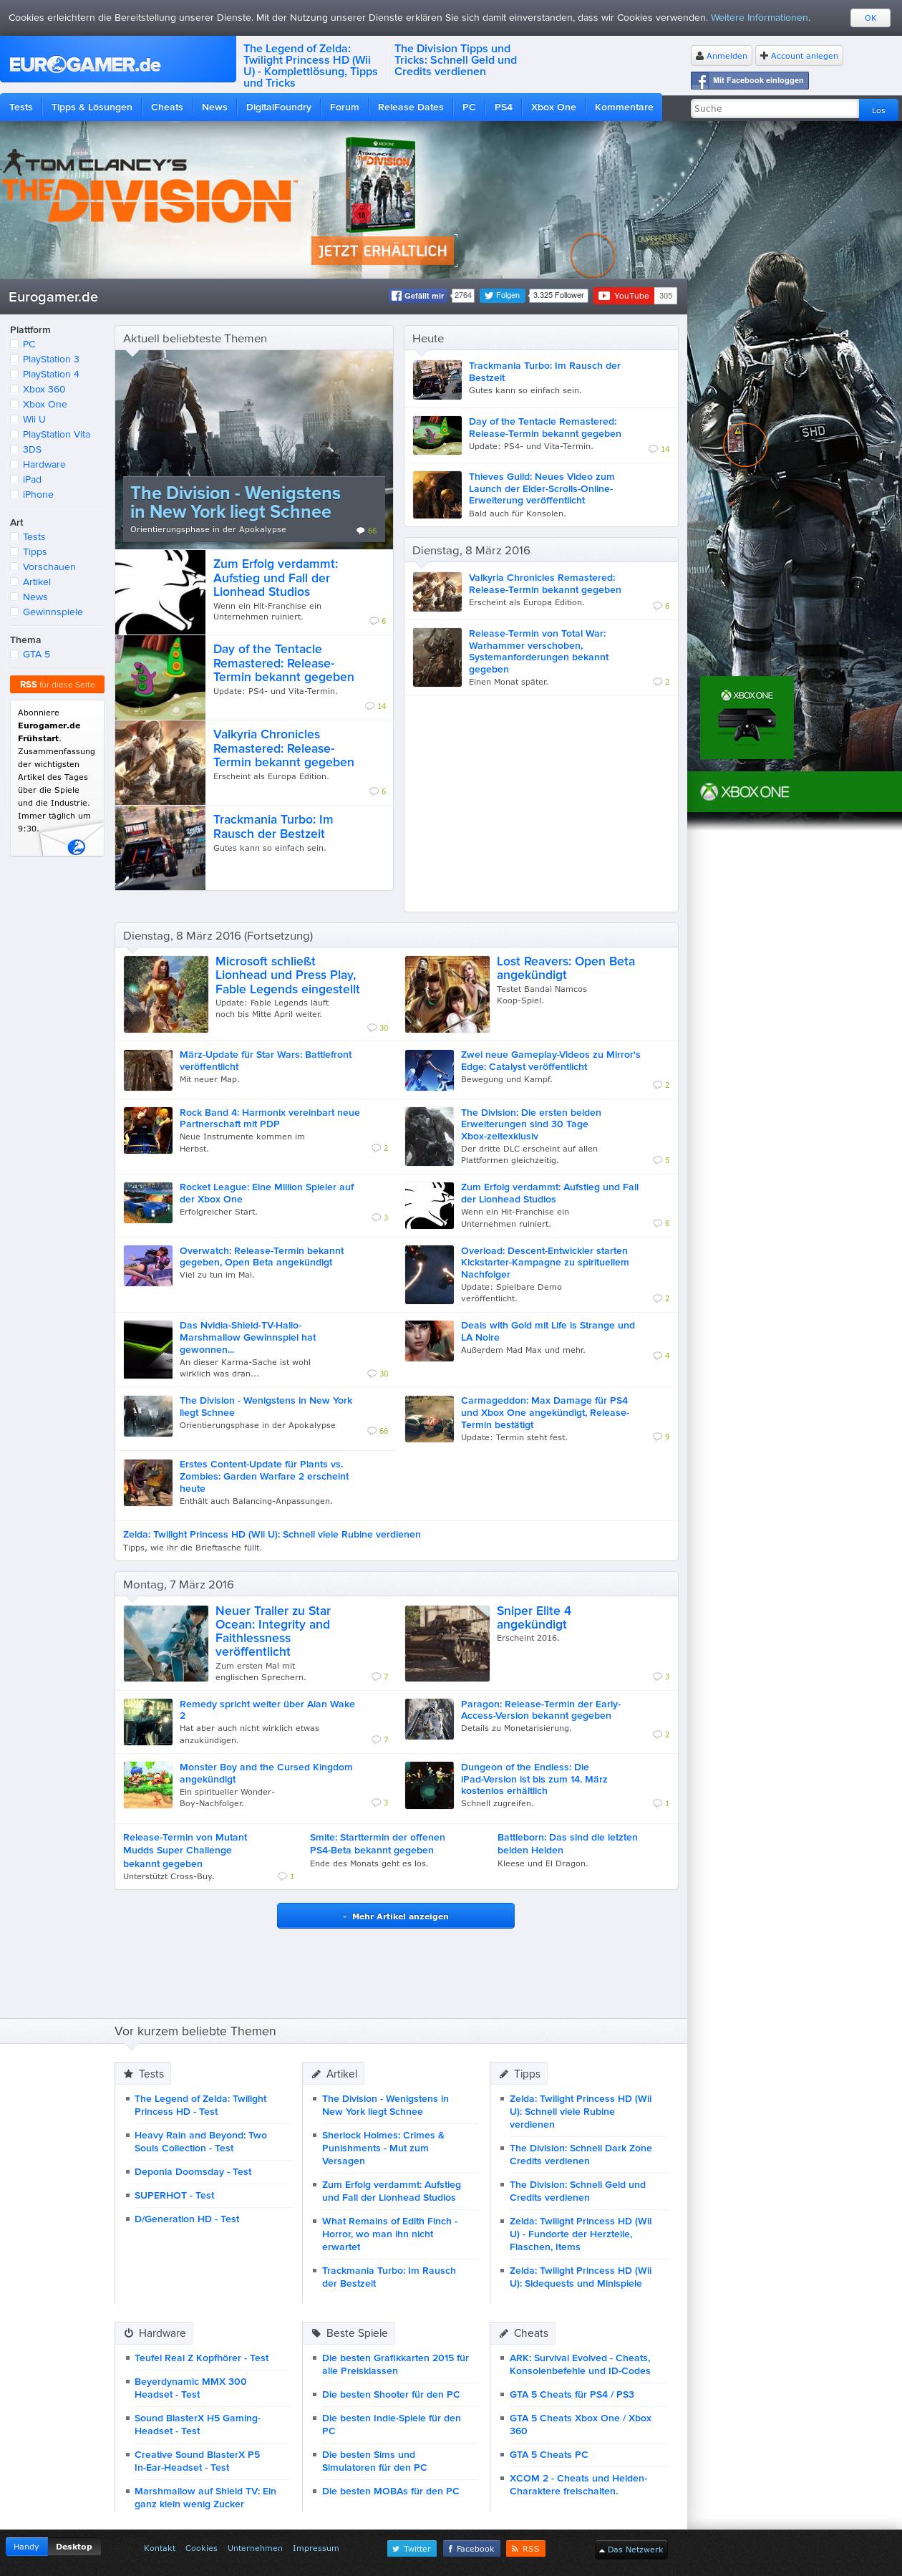 Eurogamer.de Competitors, Revenue and Employees - Owler Company Profile